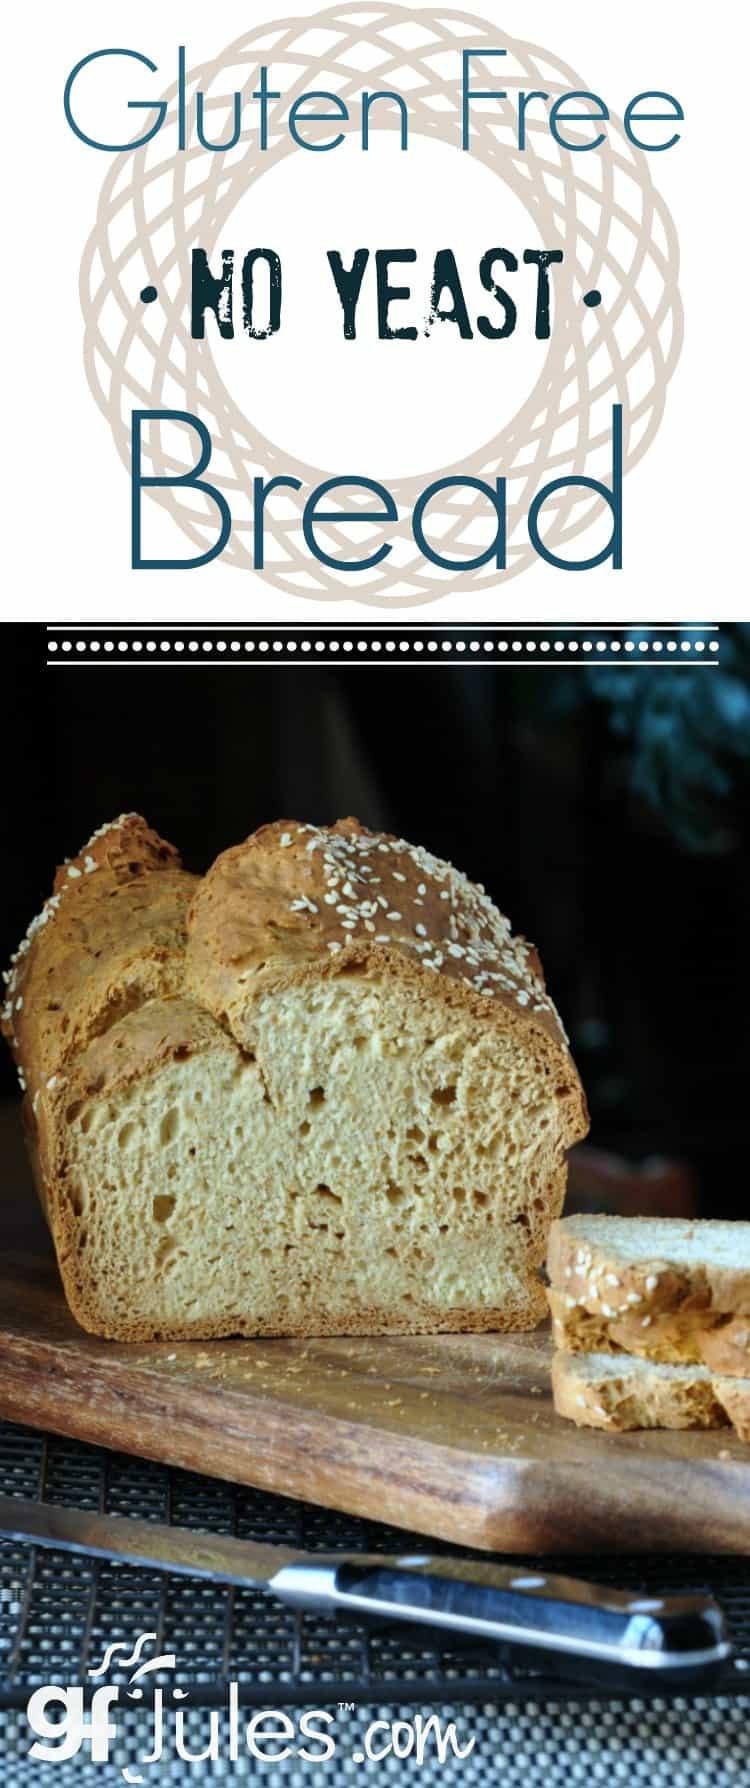 Gluten Free Bread No Yeast  Gluten Free No Yeast Bread Recipe for Sandwiches gfJules